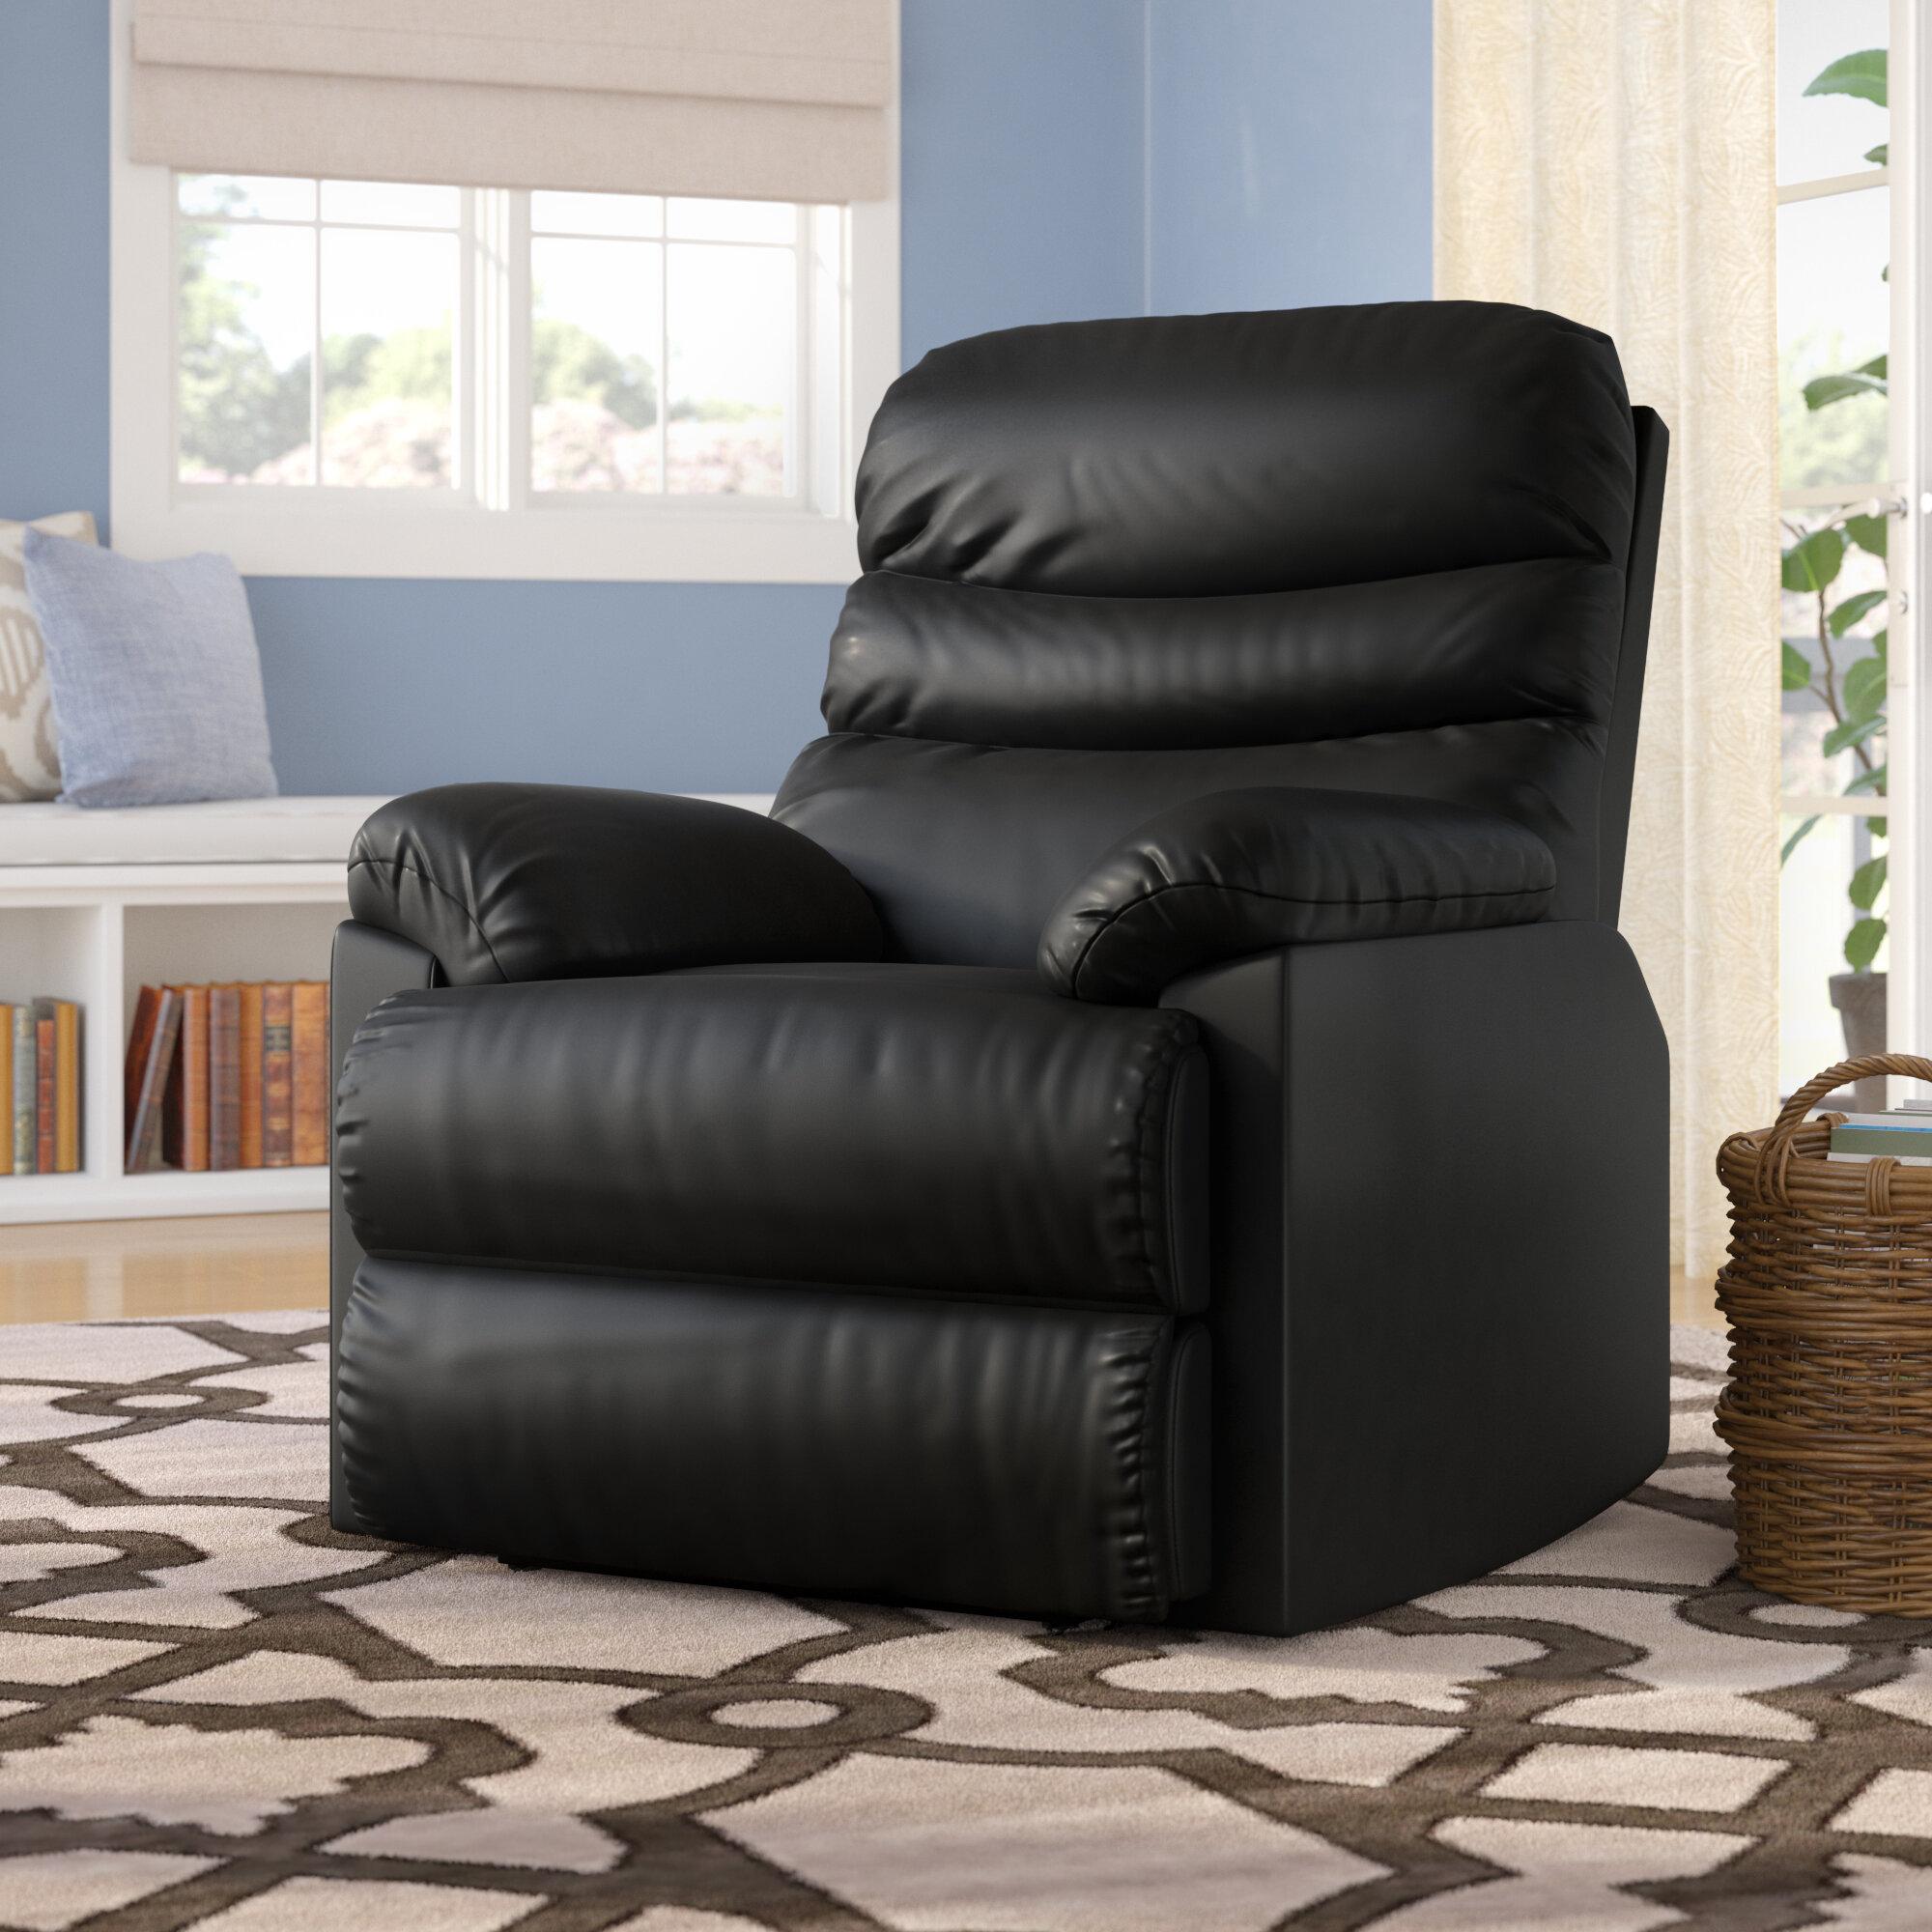 Stupendous Slim Leather Attache Cases Wayfair Unemploymentrelief Wooden Chair Designs For Living Room Unemploymentrelieforg